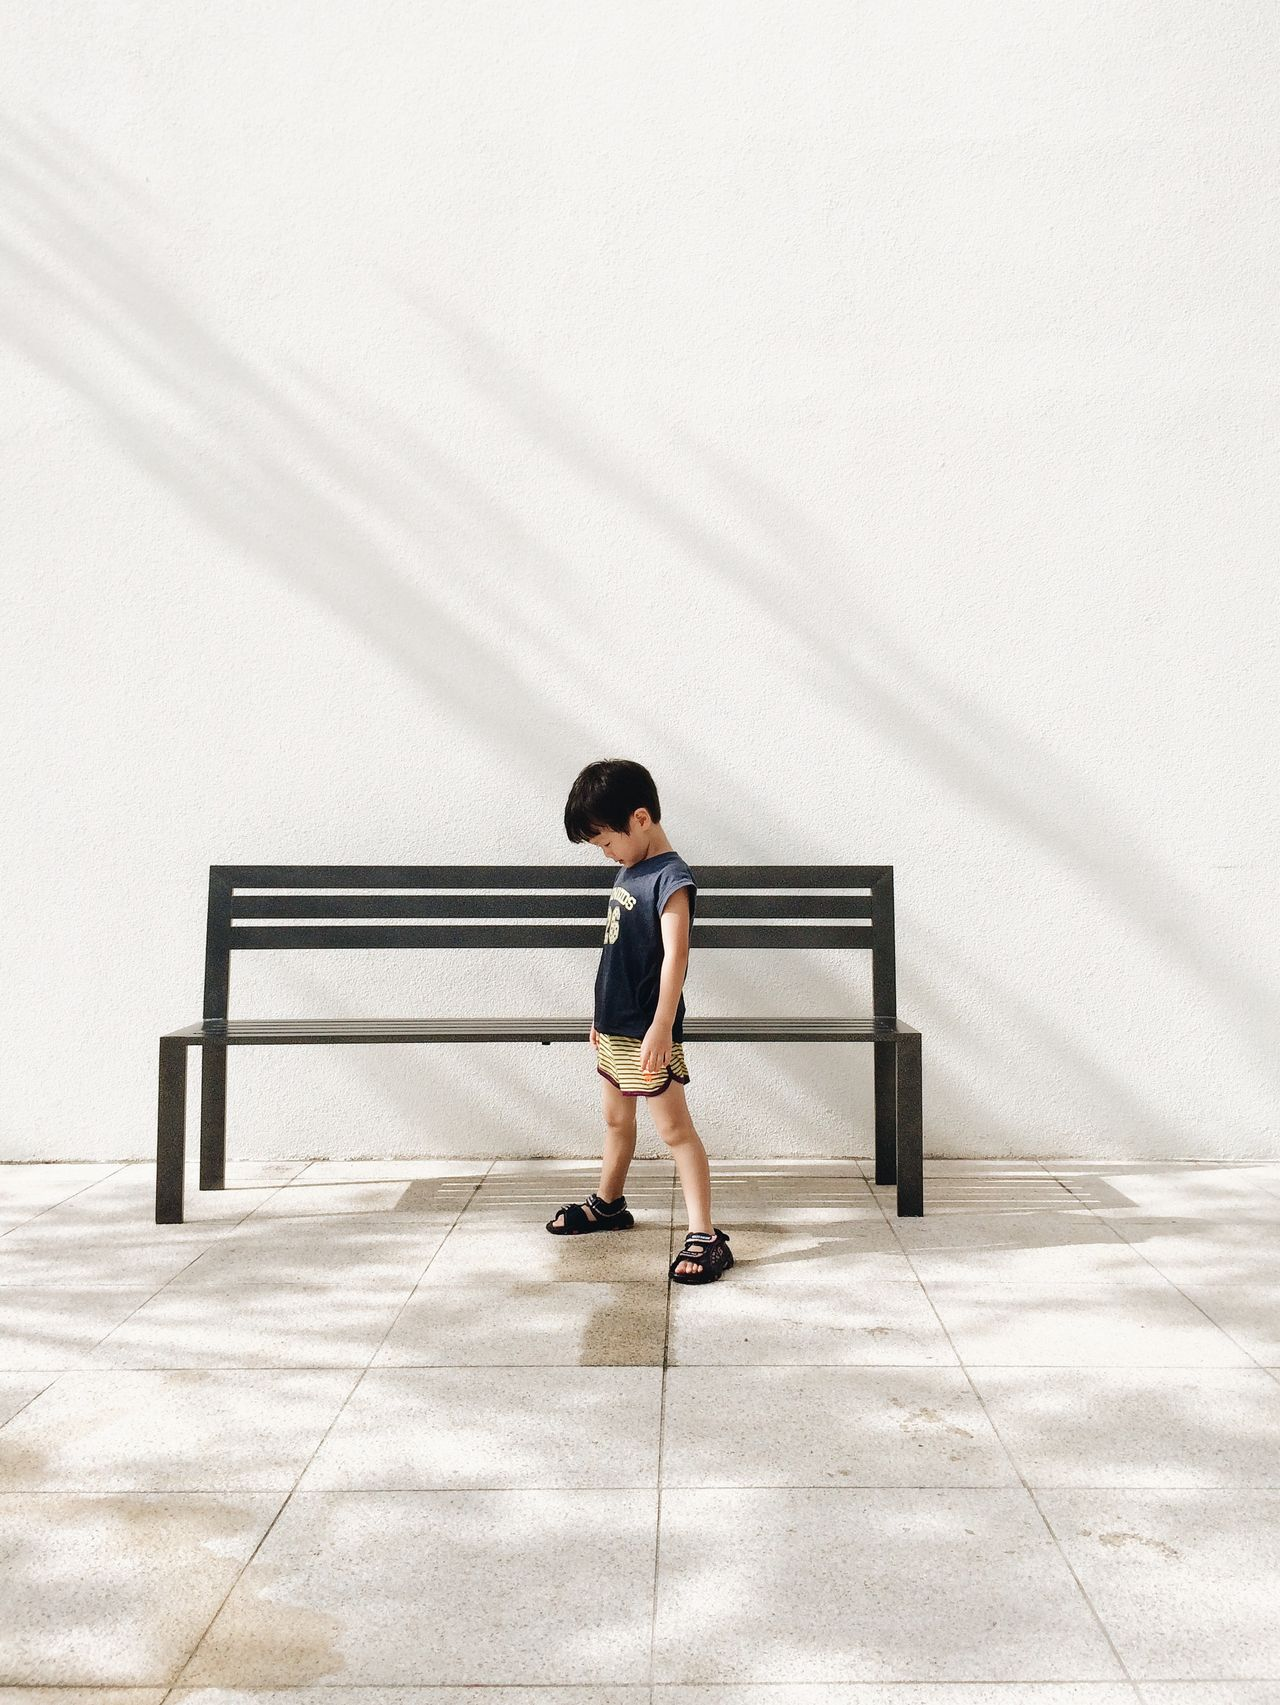 Kid Kidsphotography EyeEm Korea Minimalism Portrait